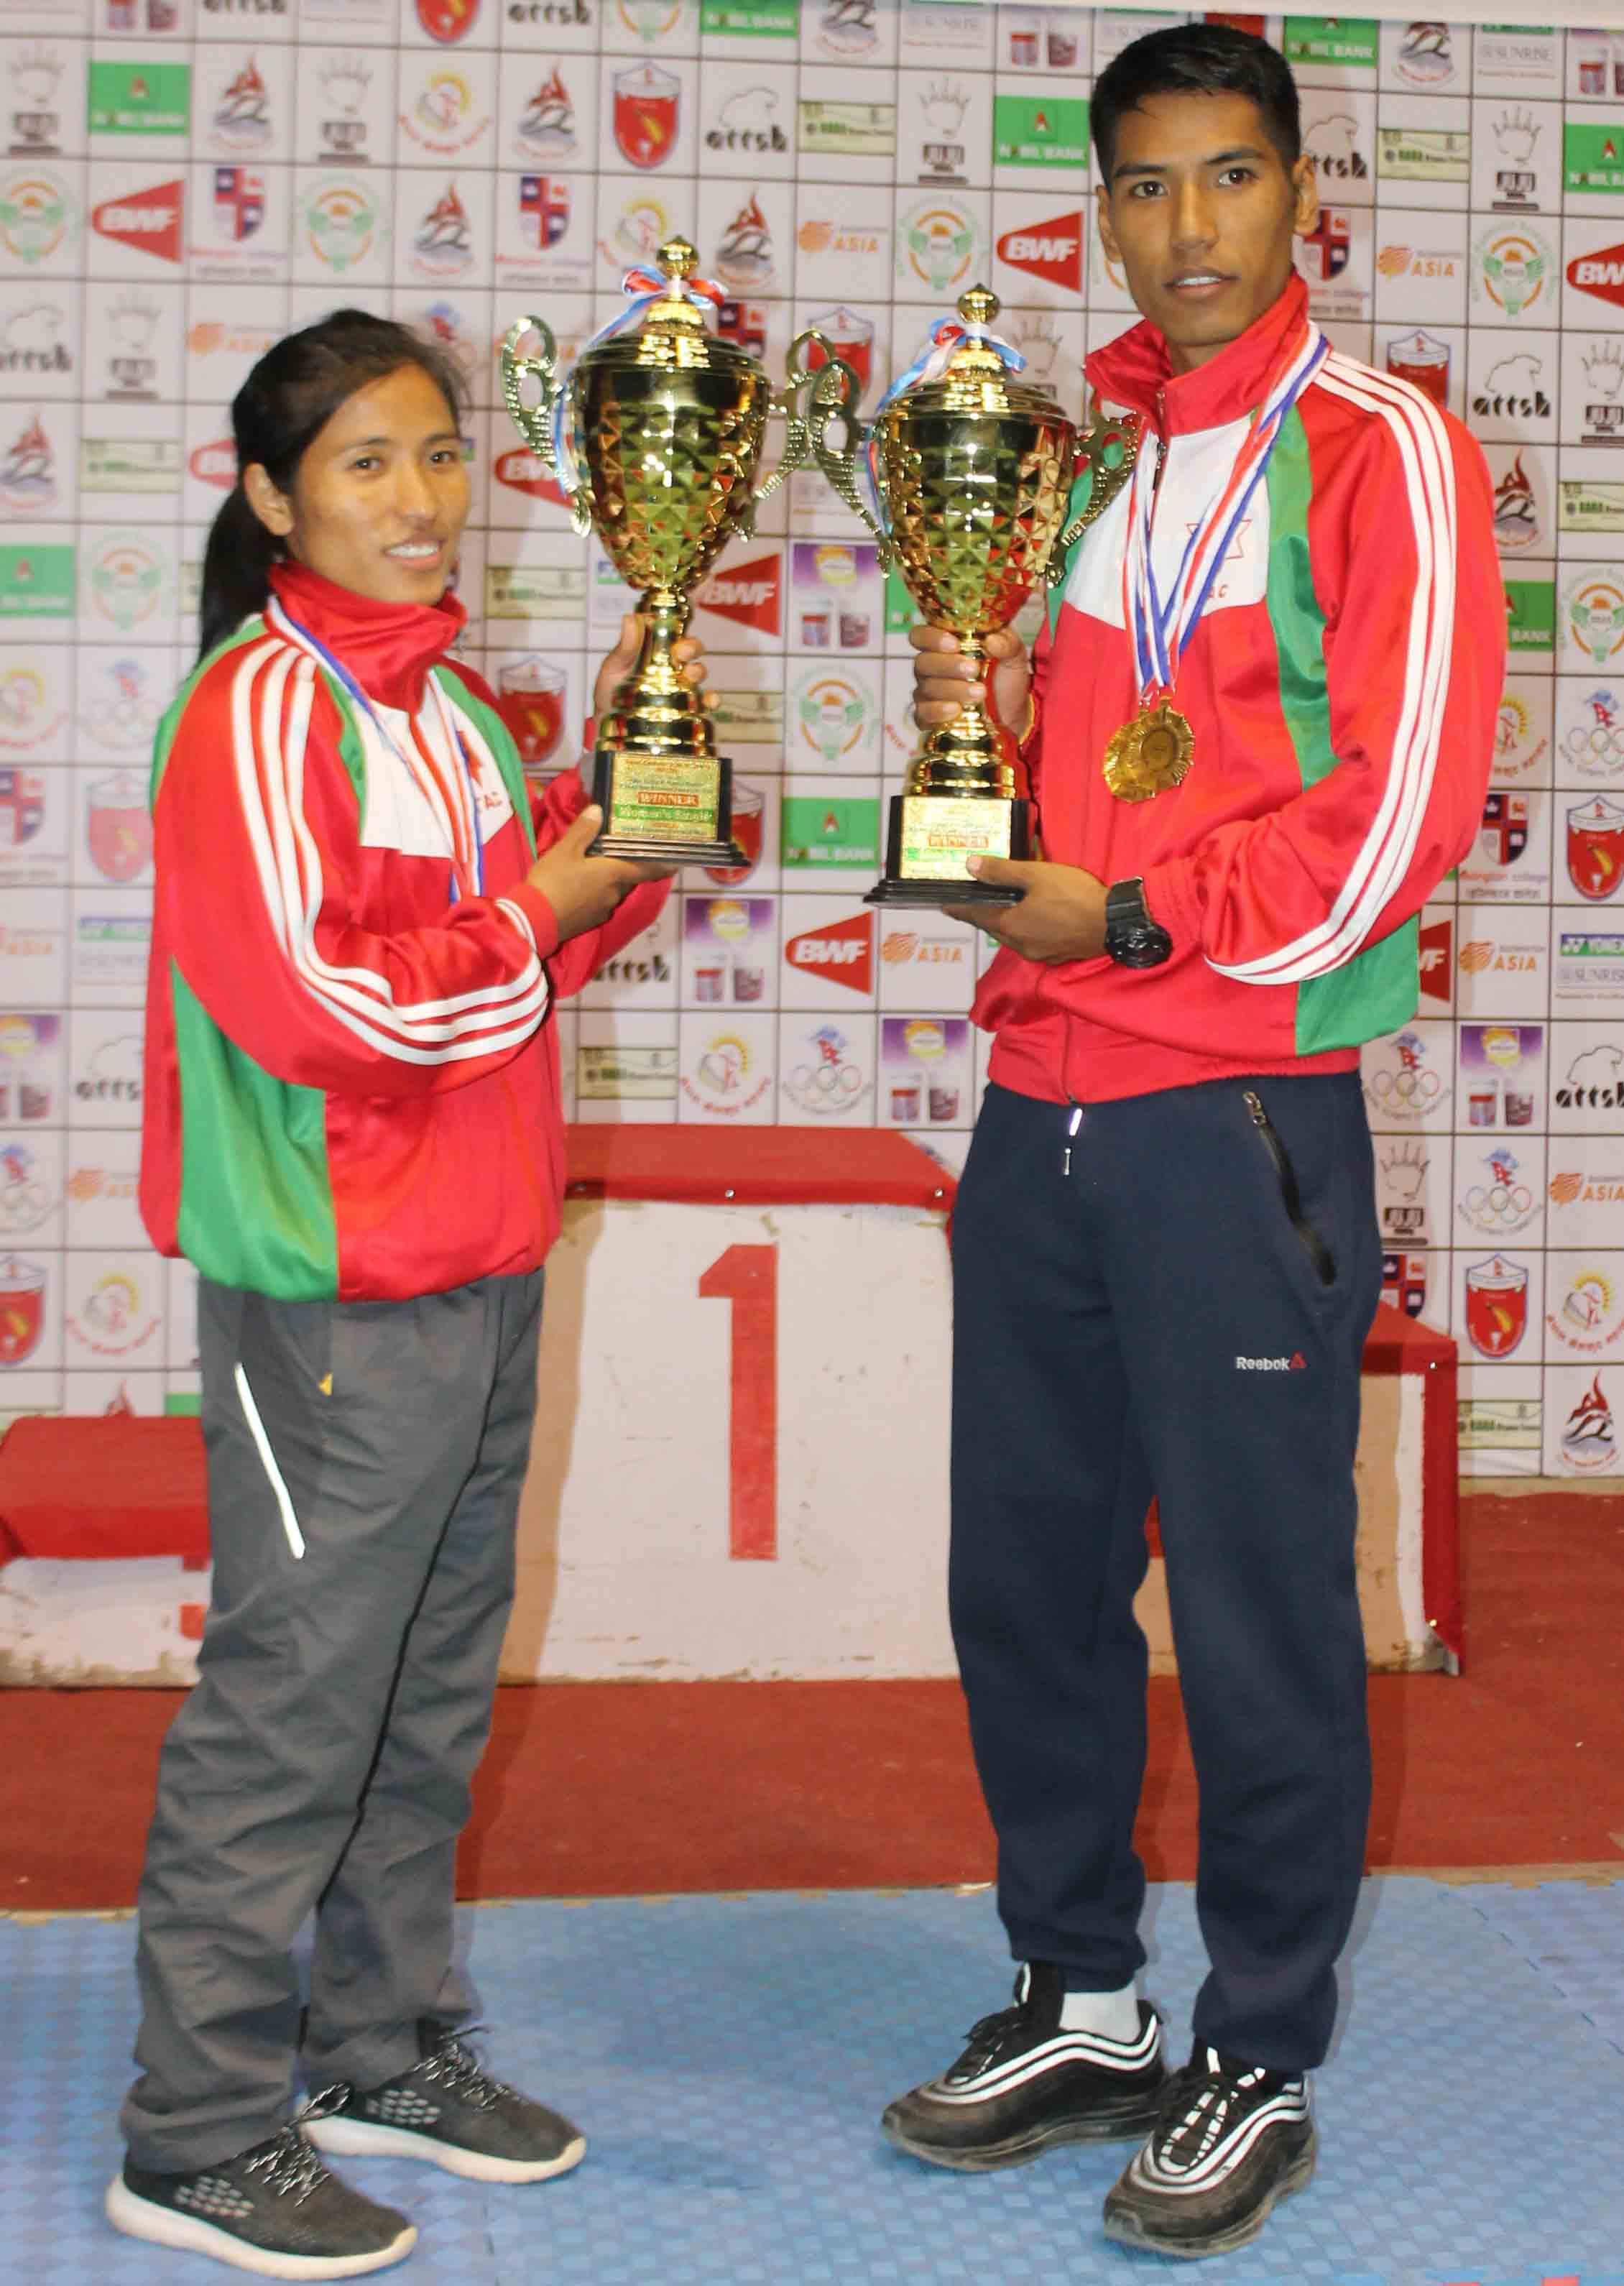 Tamang siblings Nangsal and Ratnajit hold their trophies after the Sunrise Yonex eighth Pushpalal Memorial National Open Badminton in Kathmandu on Saturday, November 17, 2018. Photo: THT